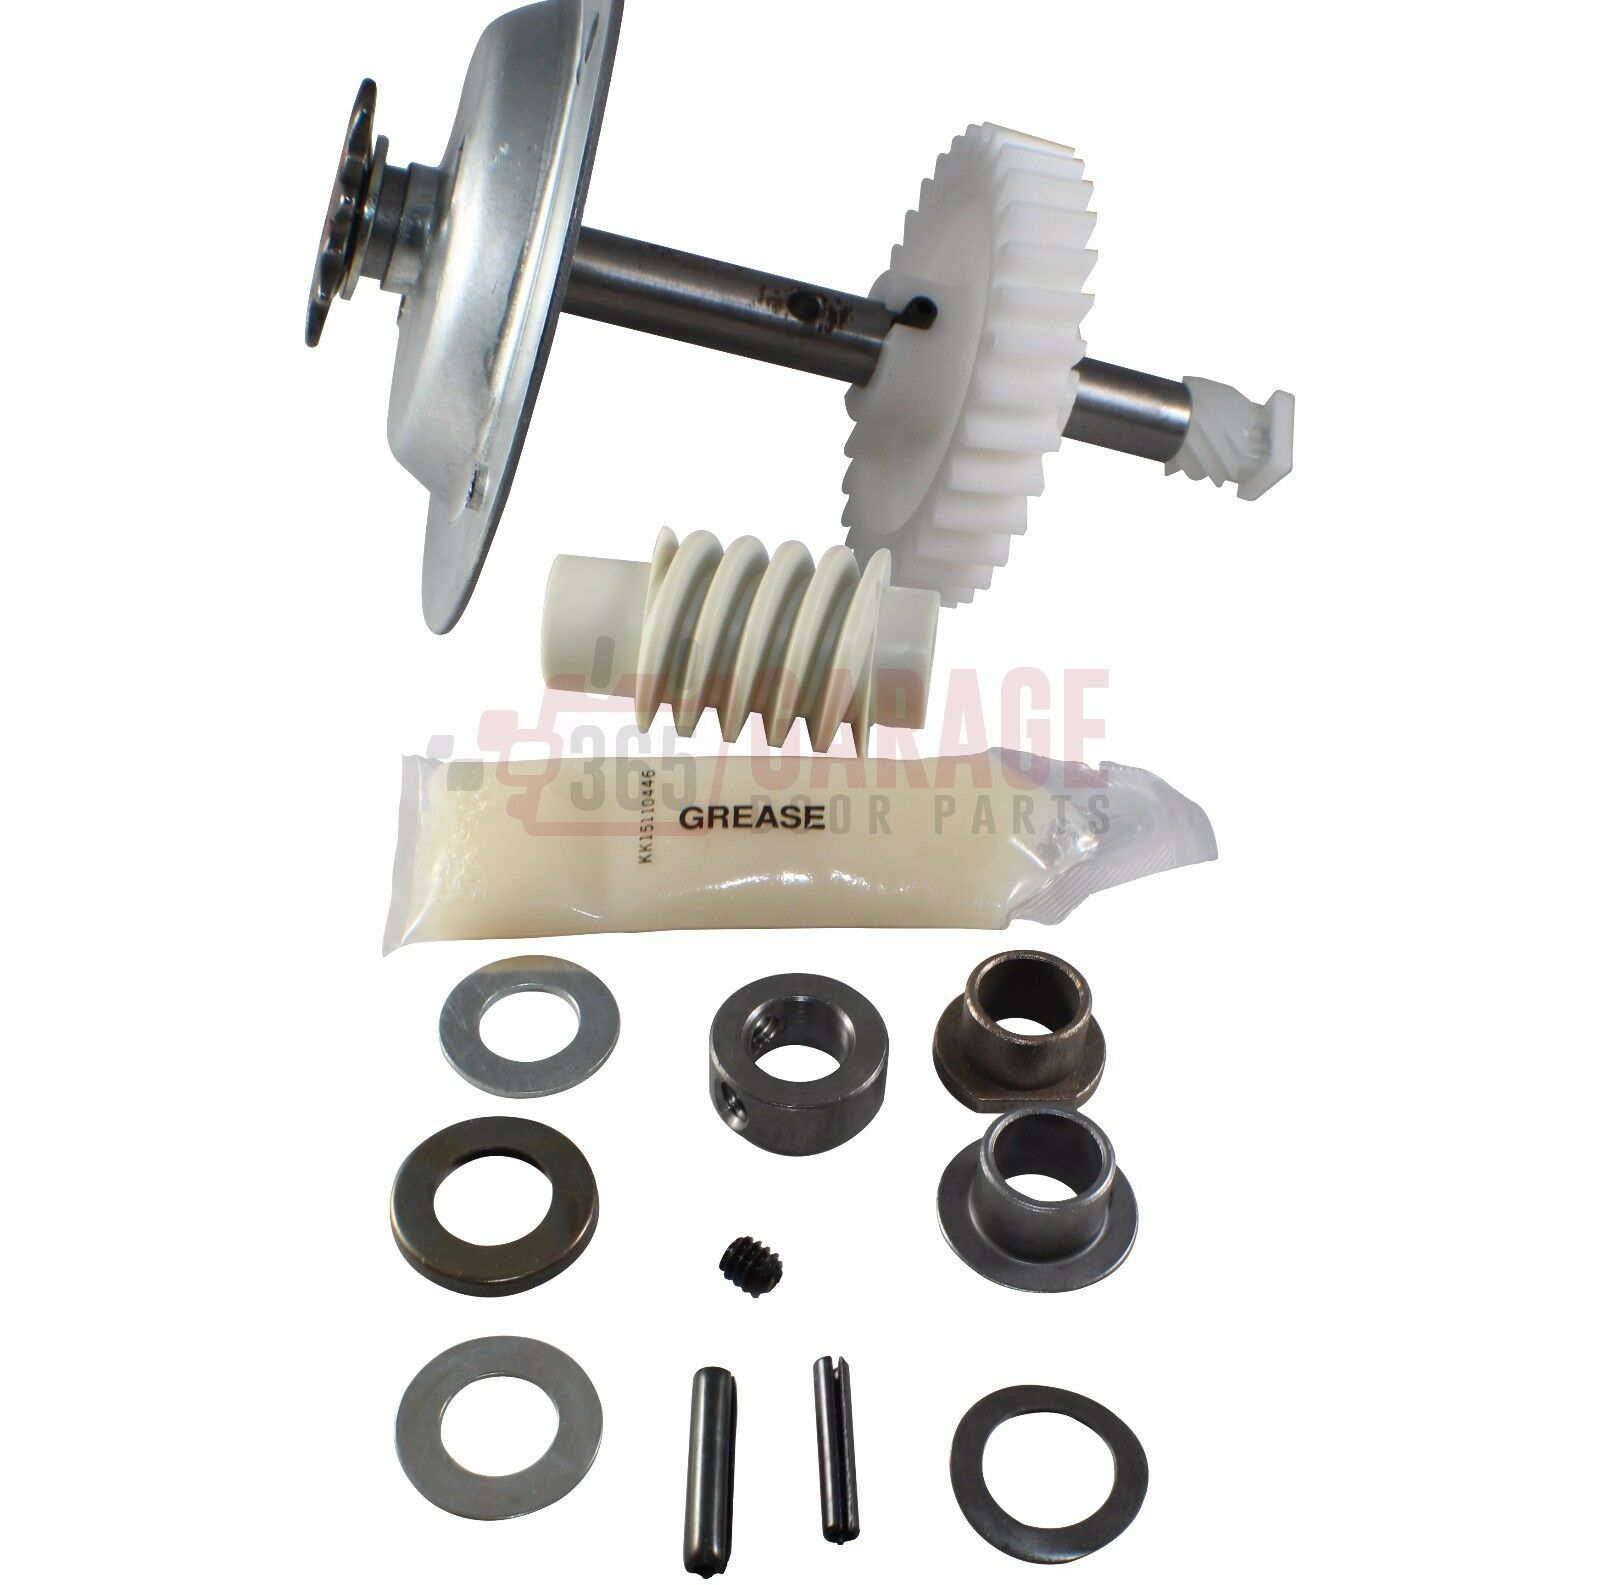 2 For 41C4220A Chamberlain Craftsman LiftMaster Sears garage door open gear kit